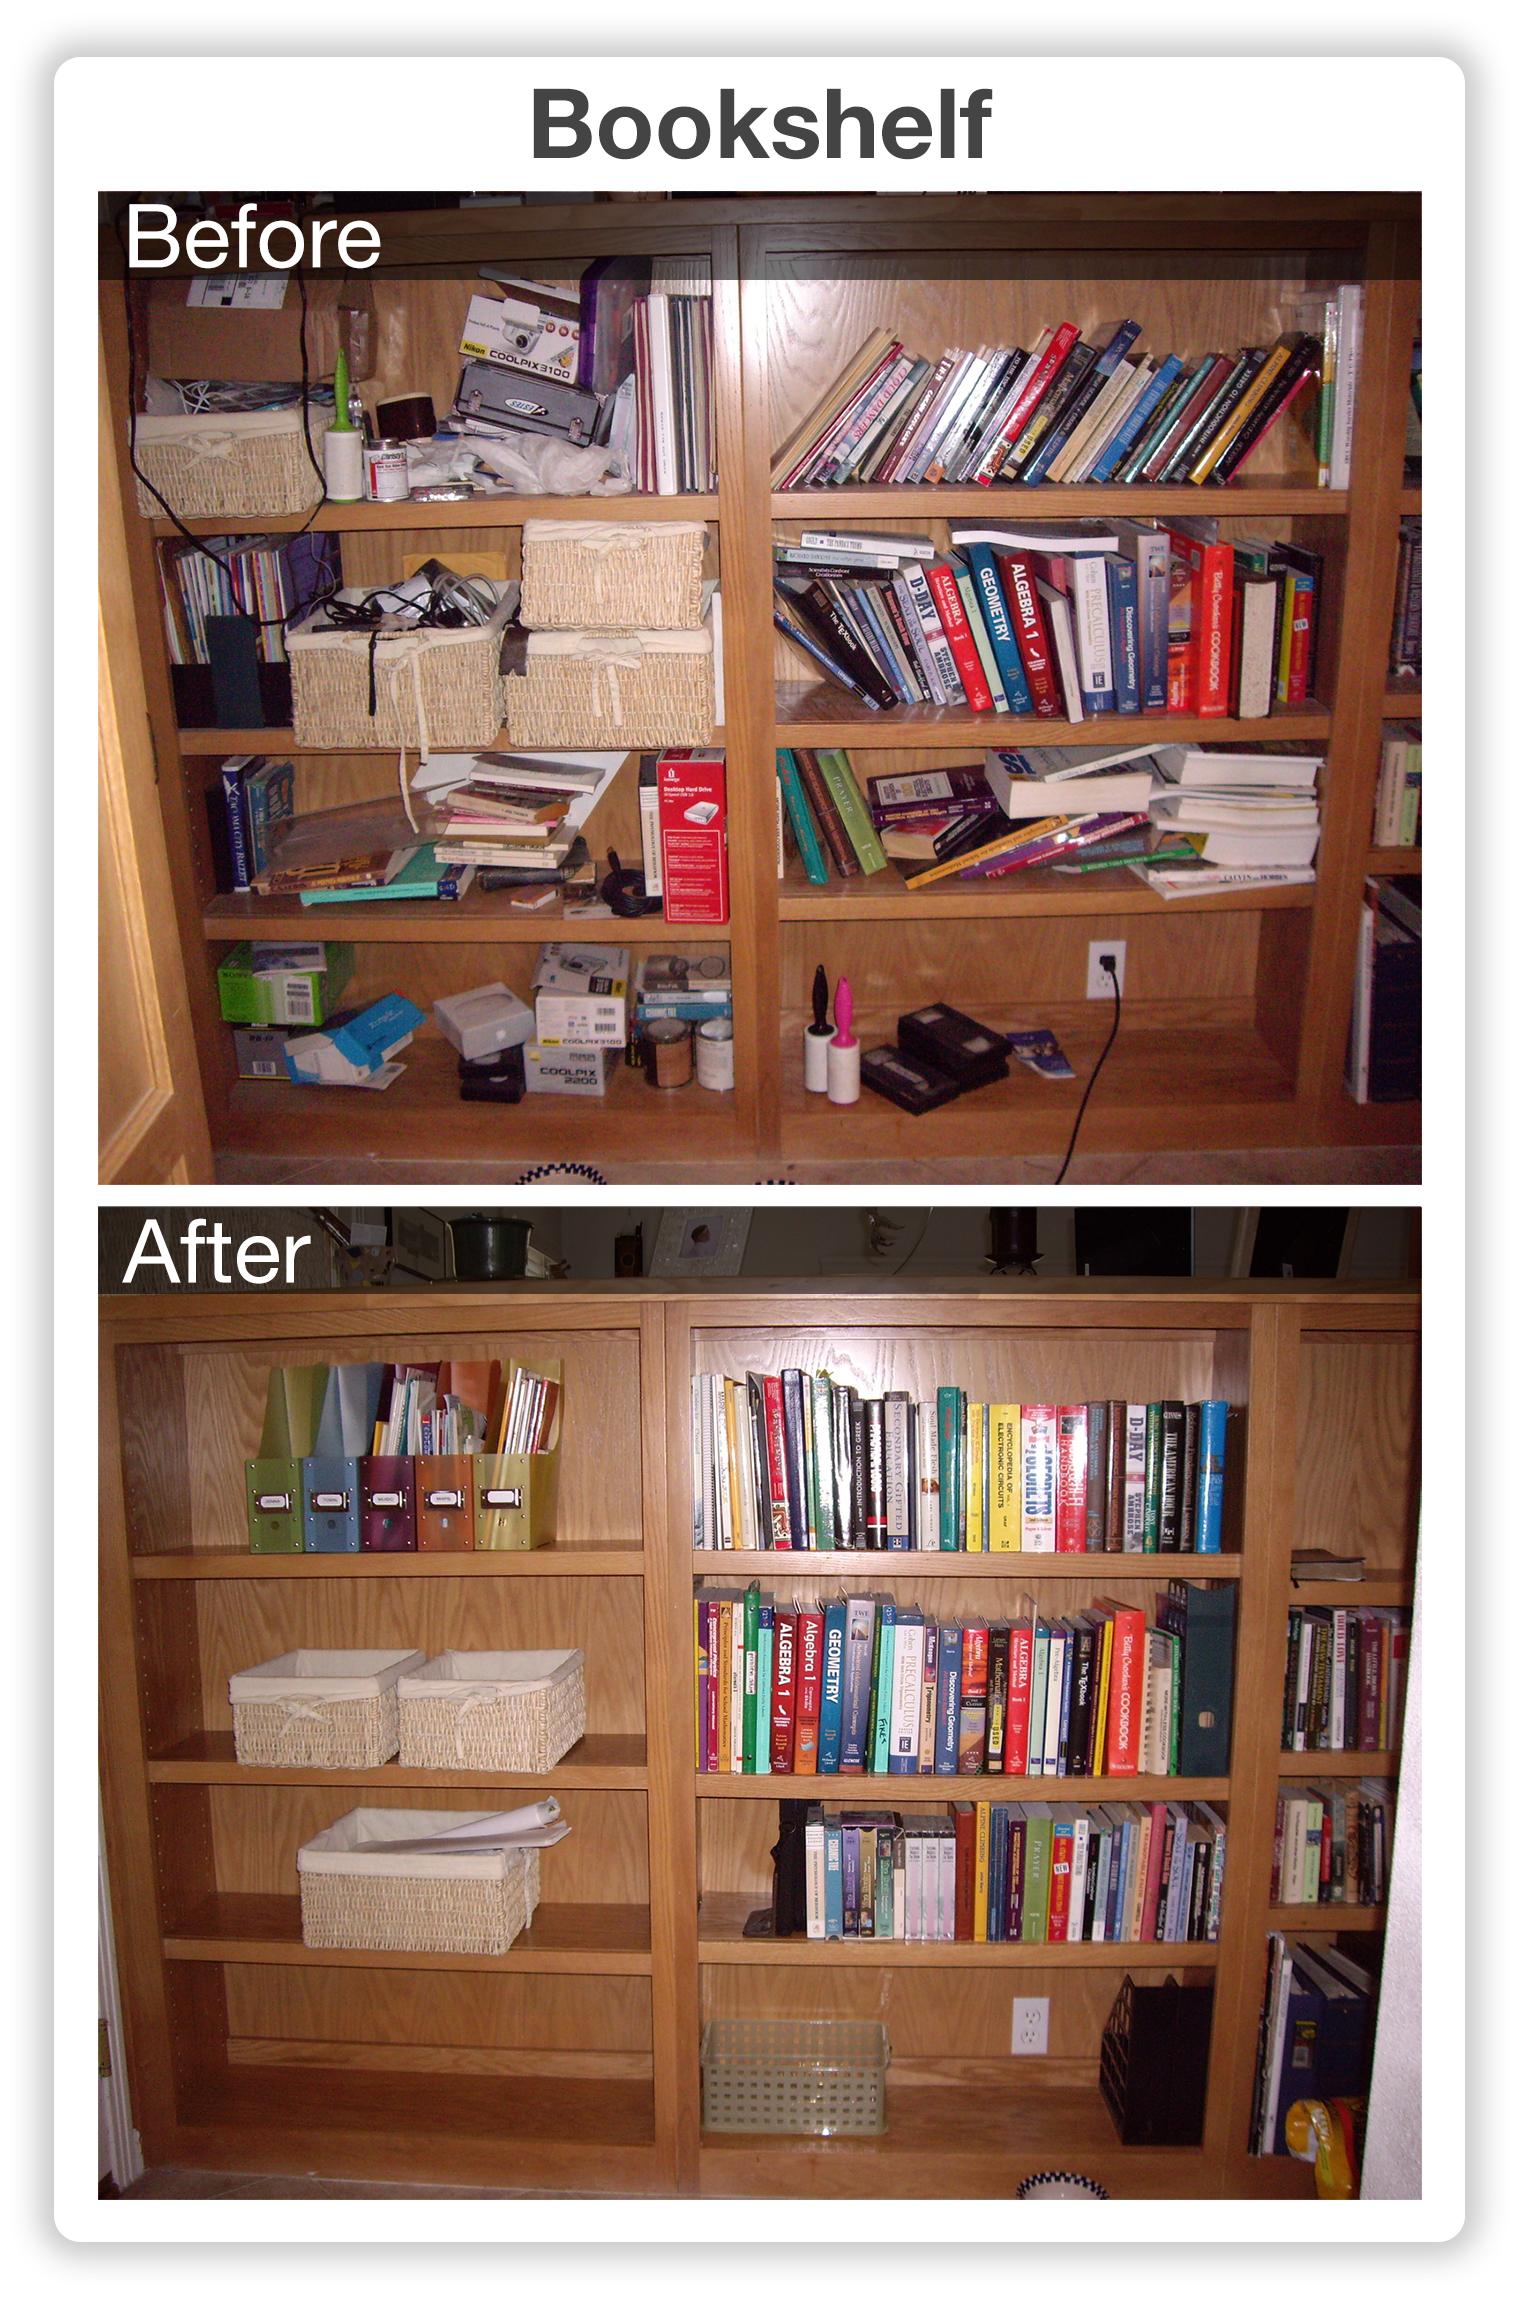 organized_by_choice_bookshelf.jpg